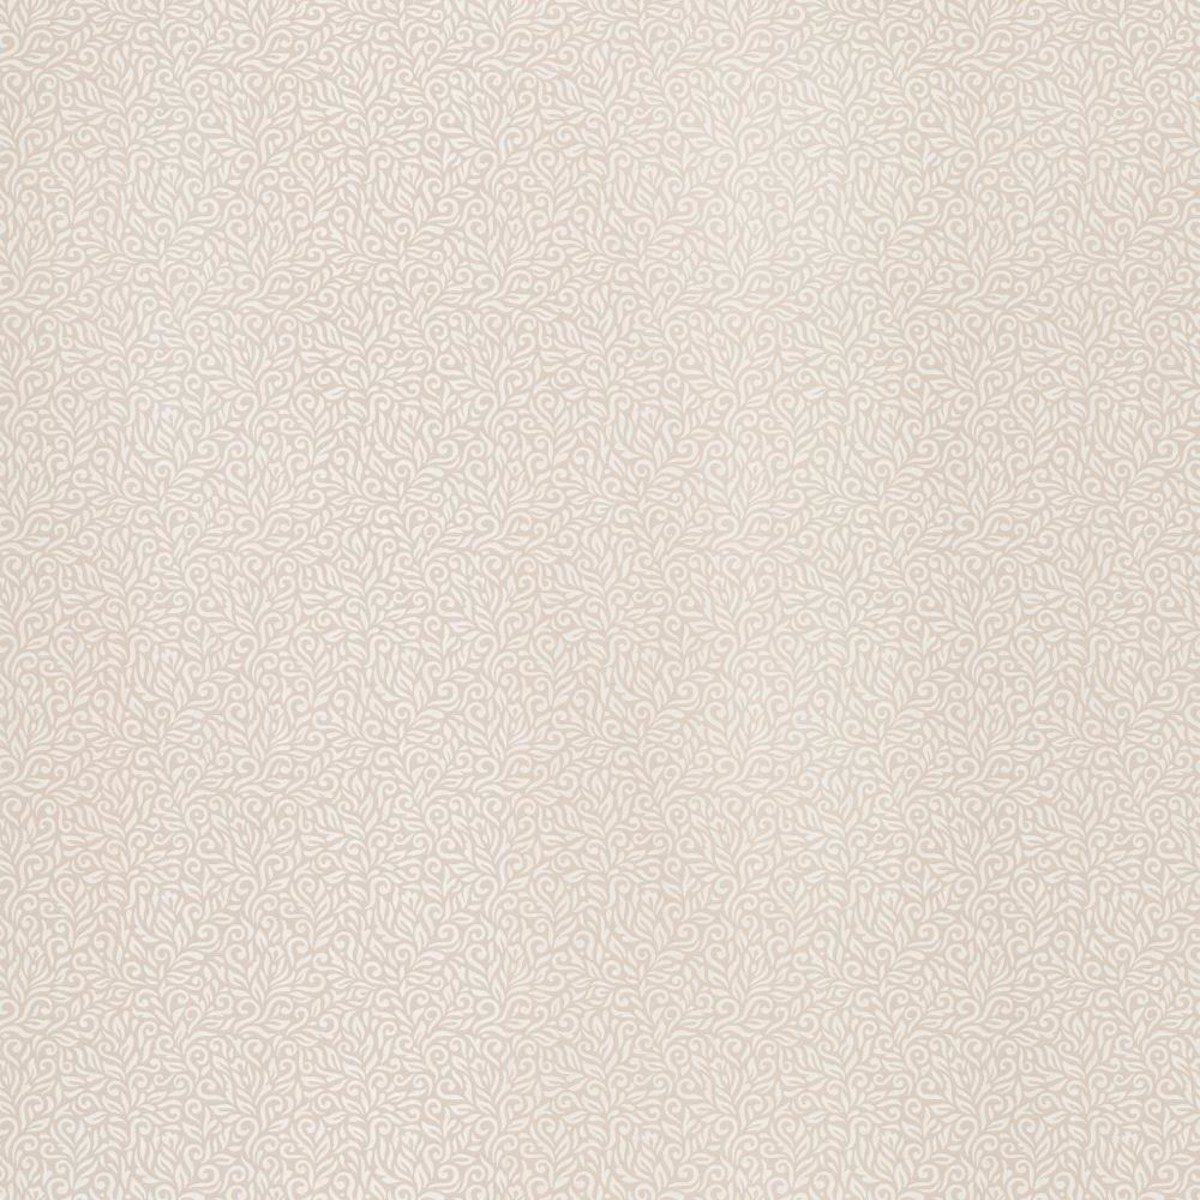 Обои виниловые Home Color Folio бежевые HC11025-22 0.53 м